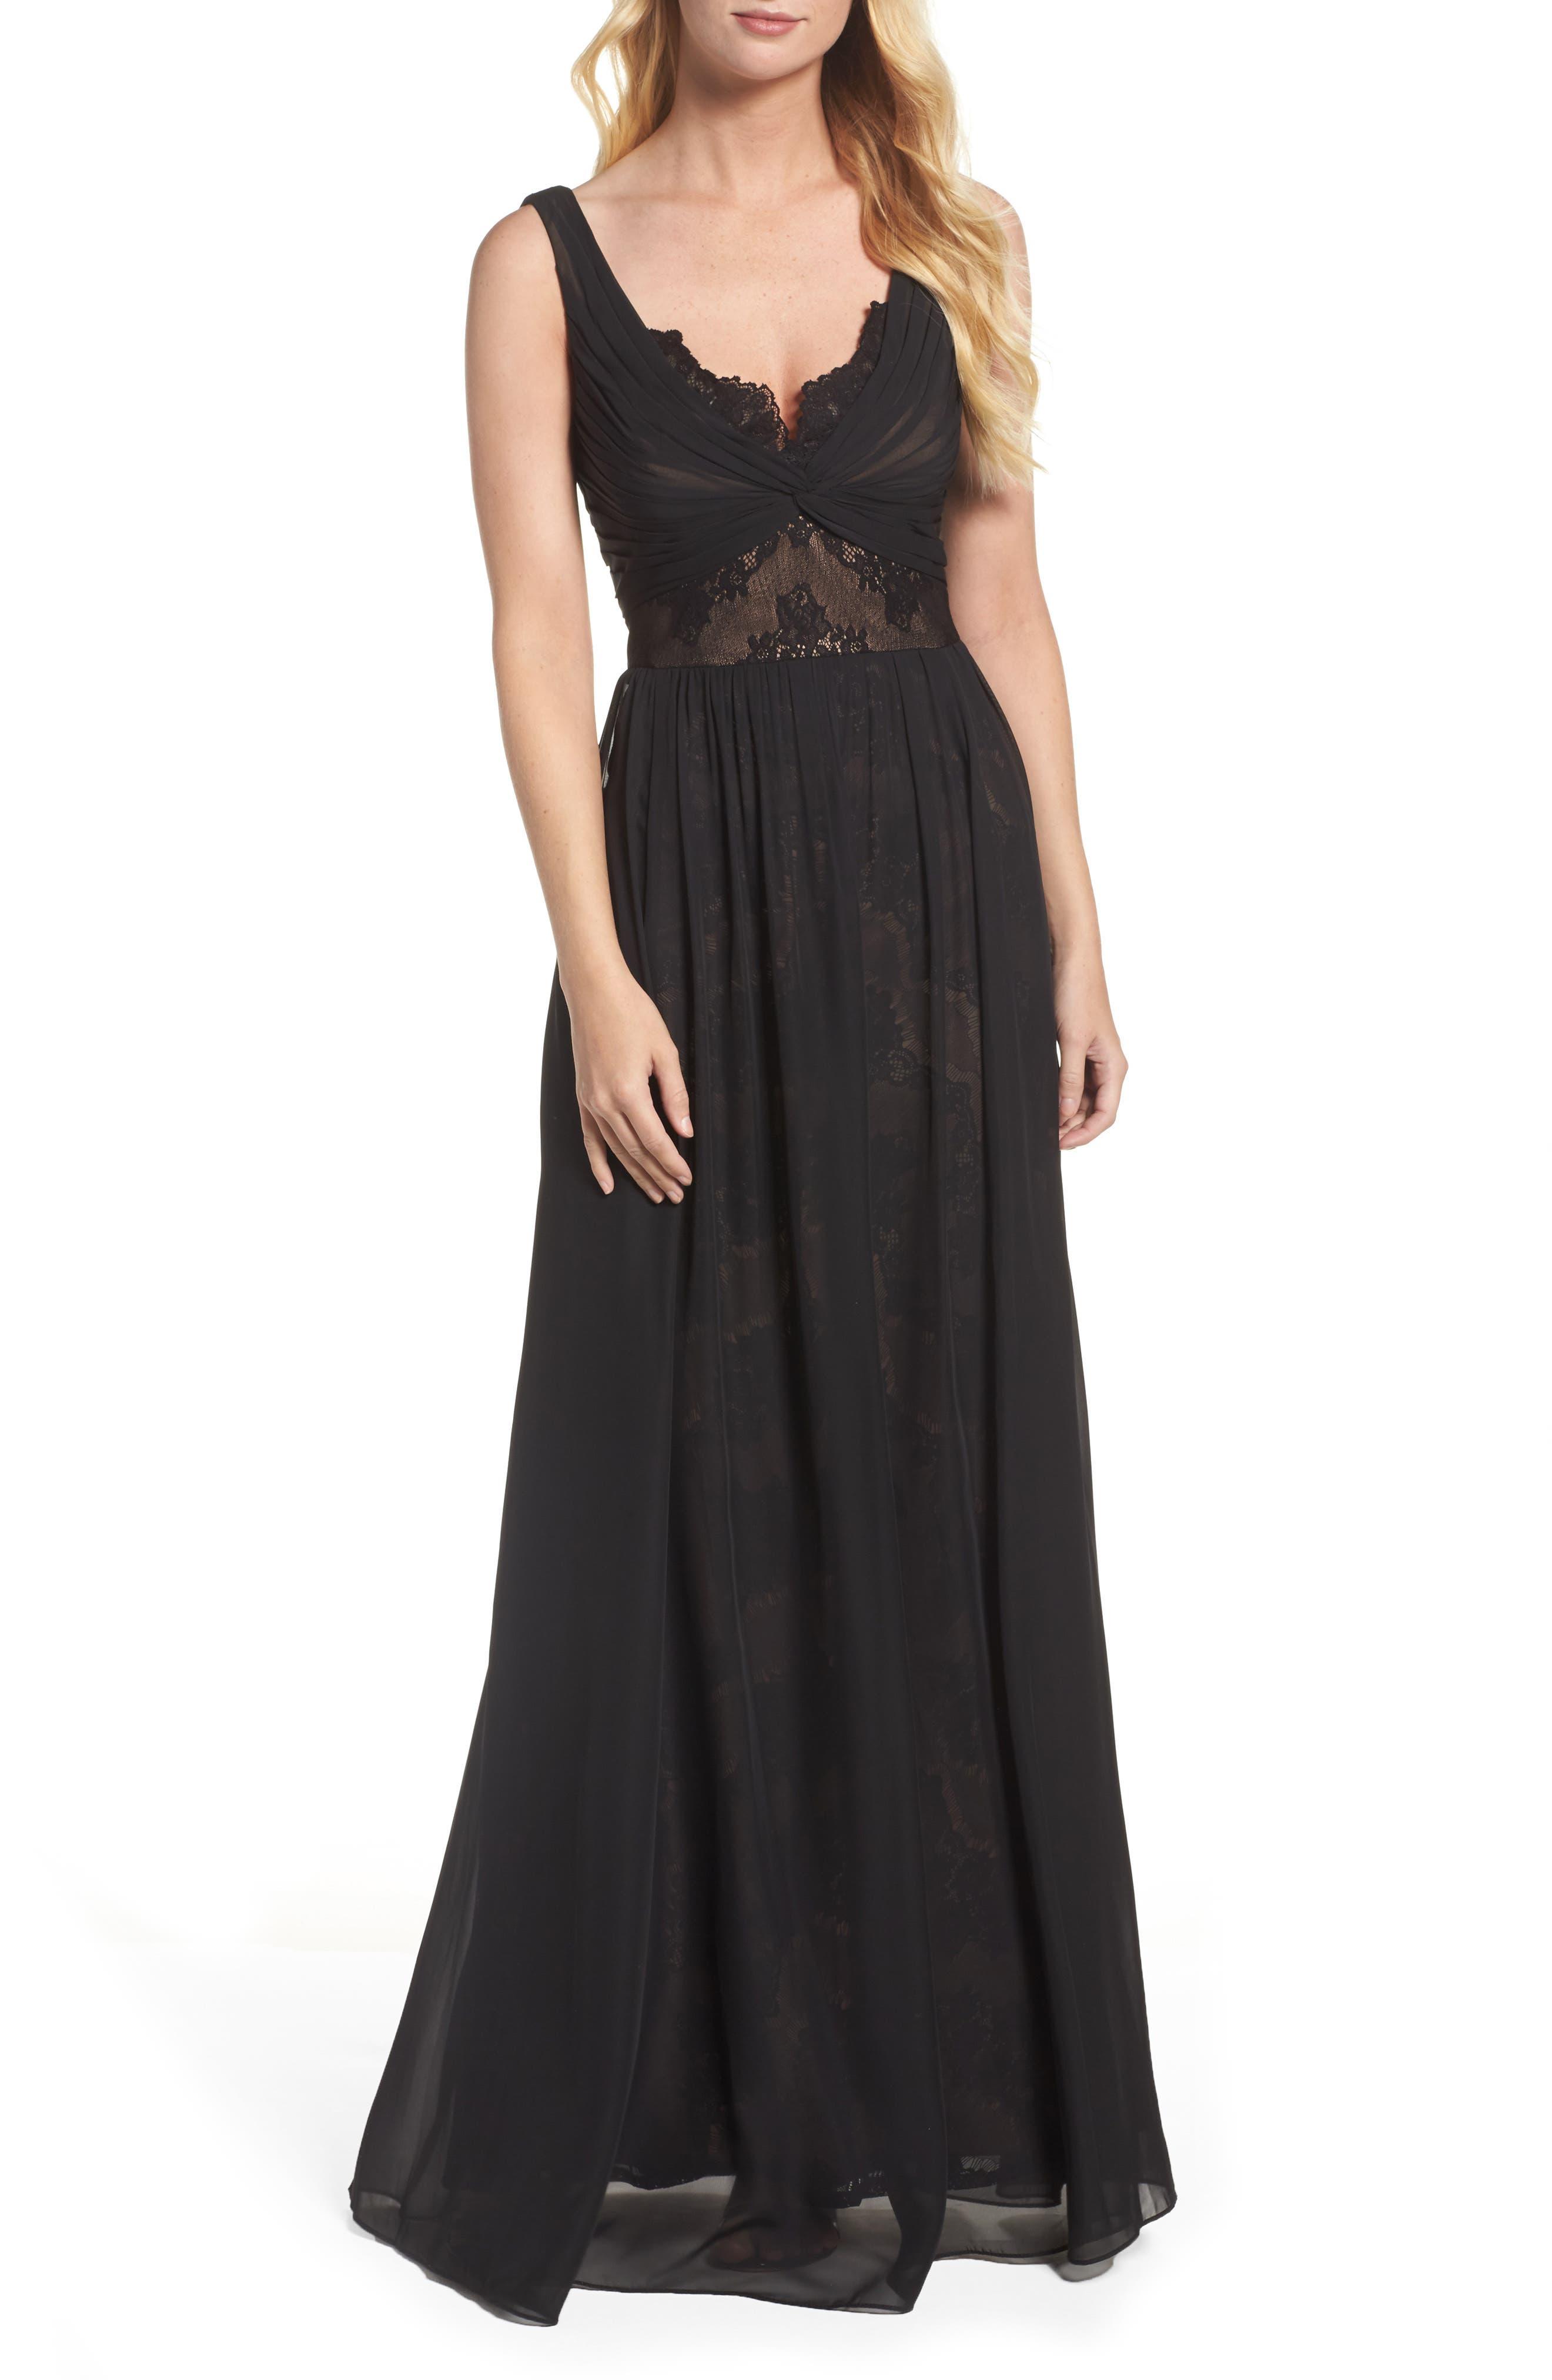 Lace Detail Gown,                             Main thumbnail 1, color,                             Black Nude